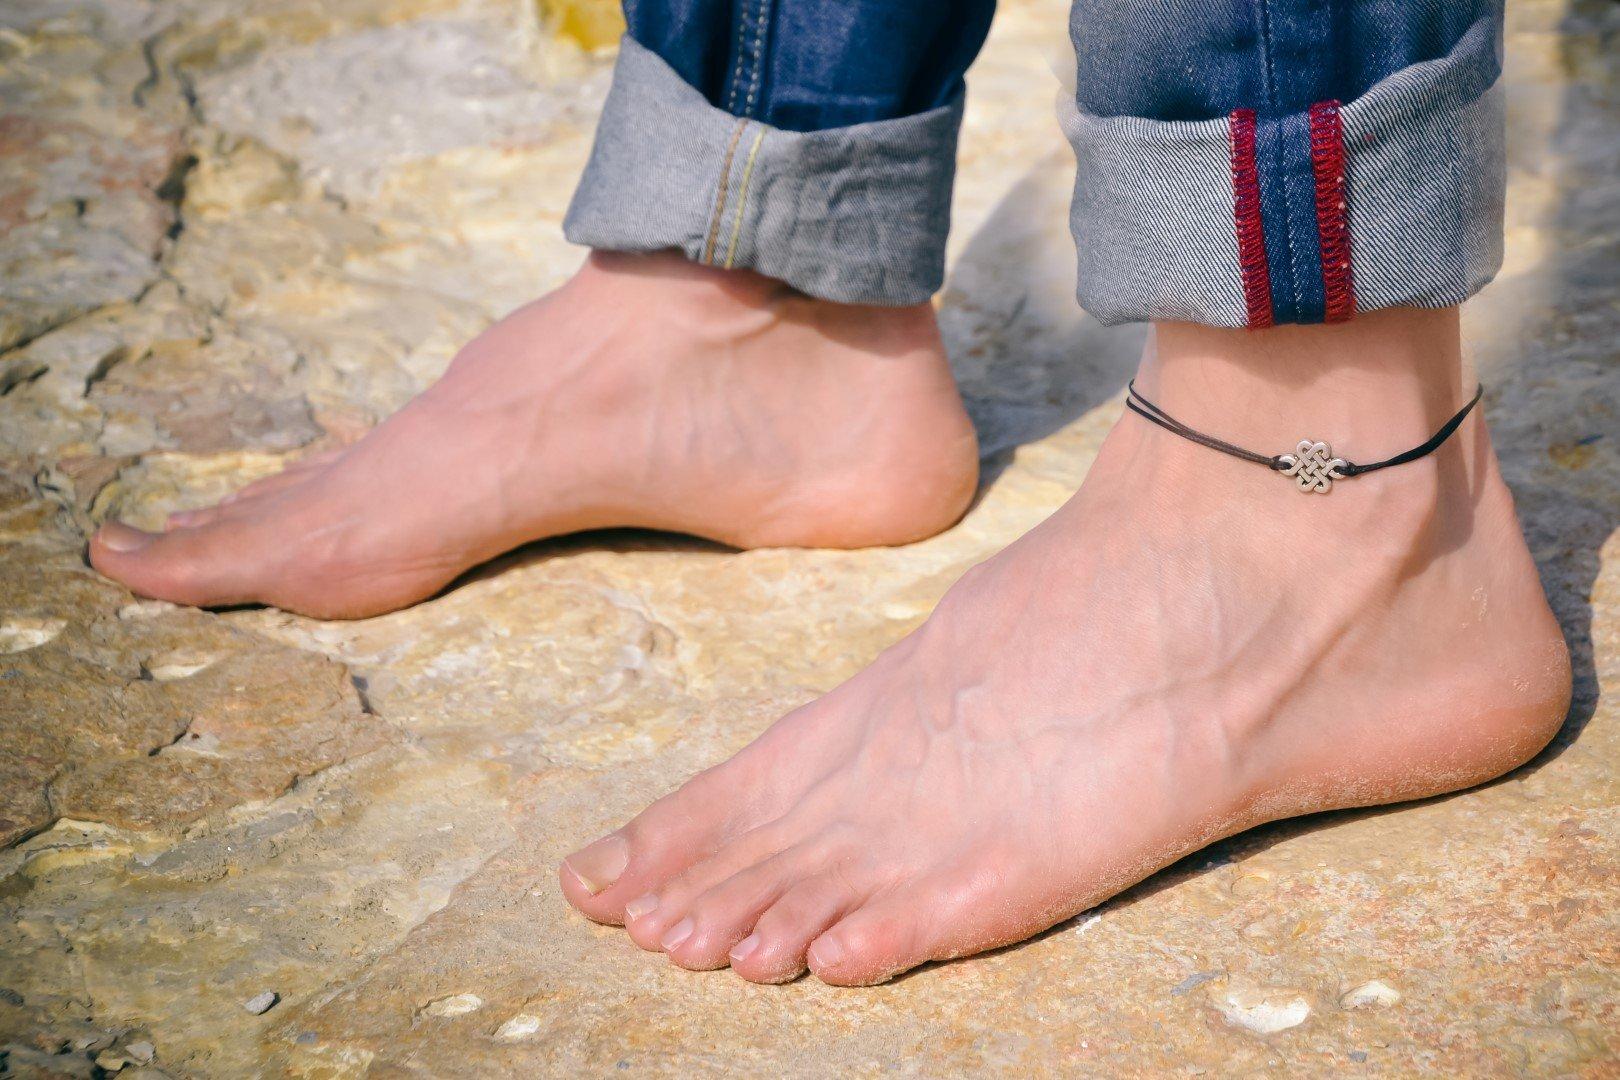 Infinity anklet for men, men's ankle bracelet with silver celtic knot charm, black cord, anklet for men, gift for him, chinese endless knot